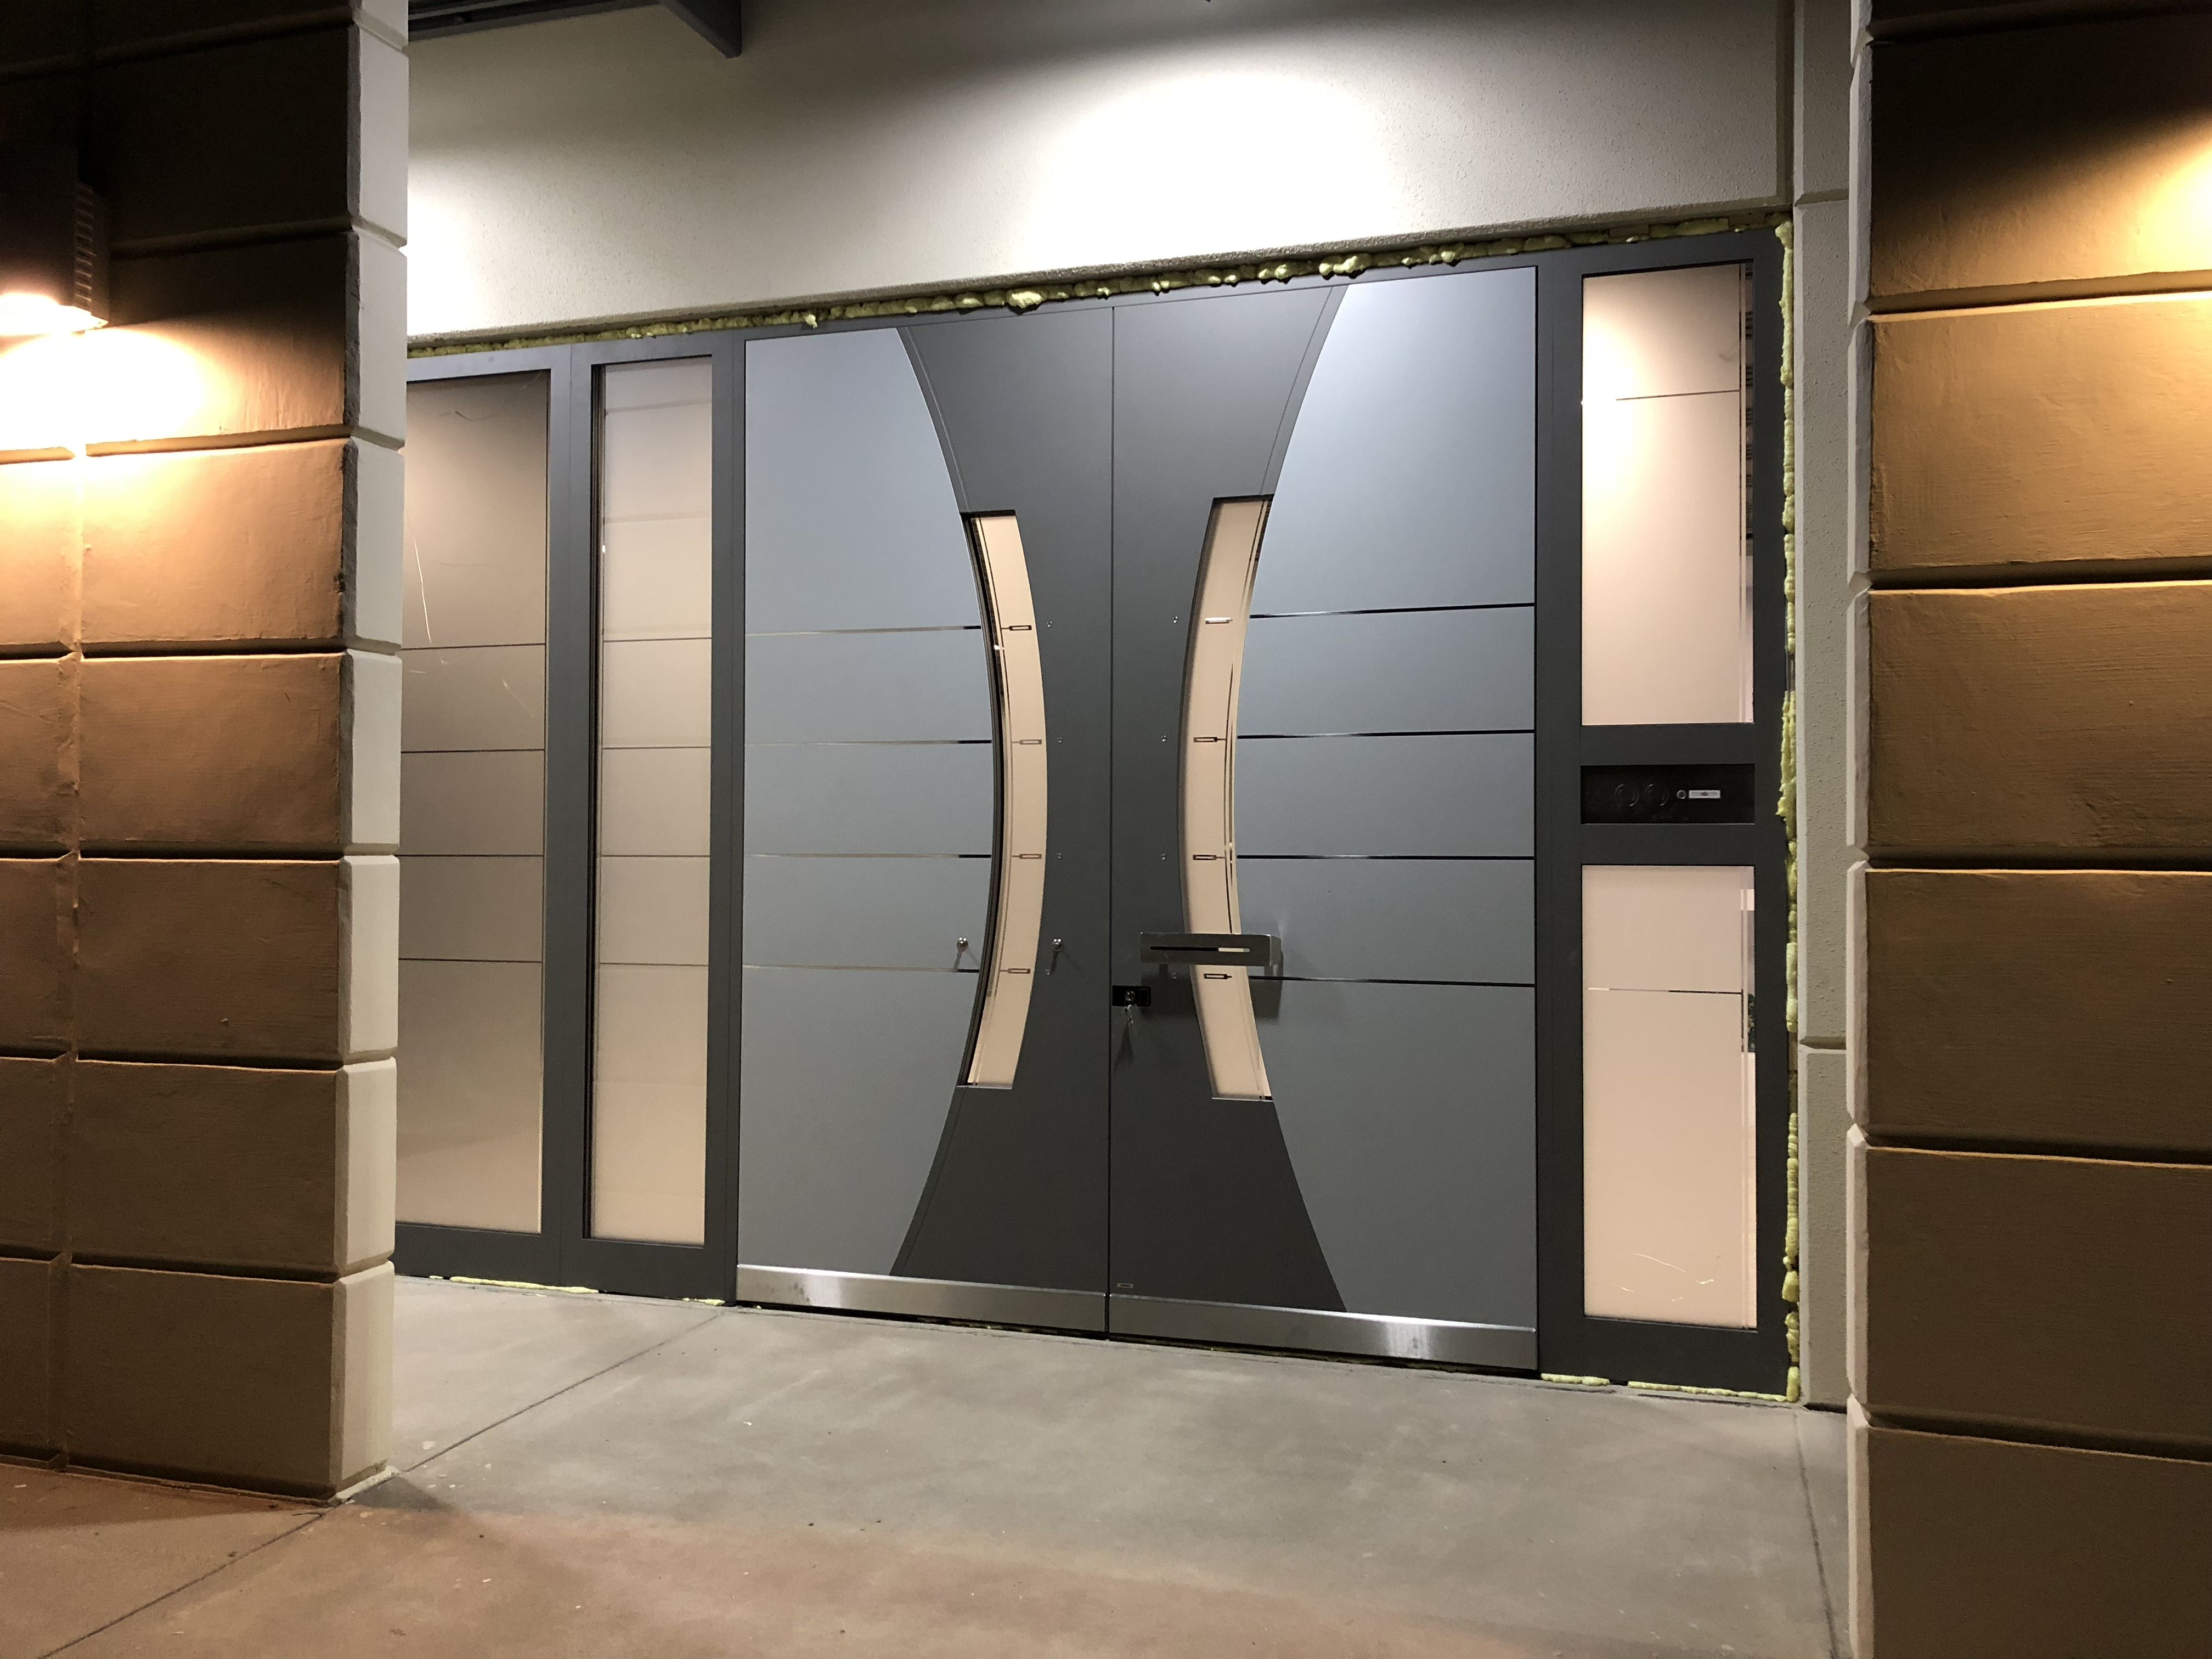 Pirnar In Texas 2 Model P0120 0120 Dimention 1235 Mm X 2990 Mm Side Light Left 580 M Exterior House Renovation Door Design Interior Modern Exterior Doors